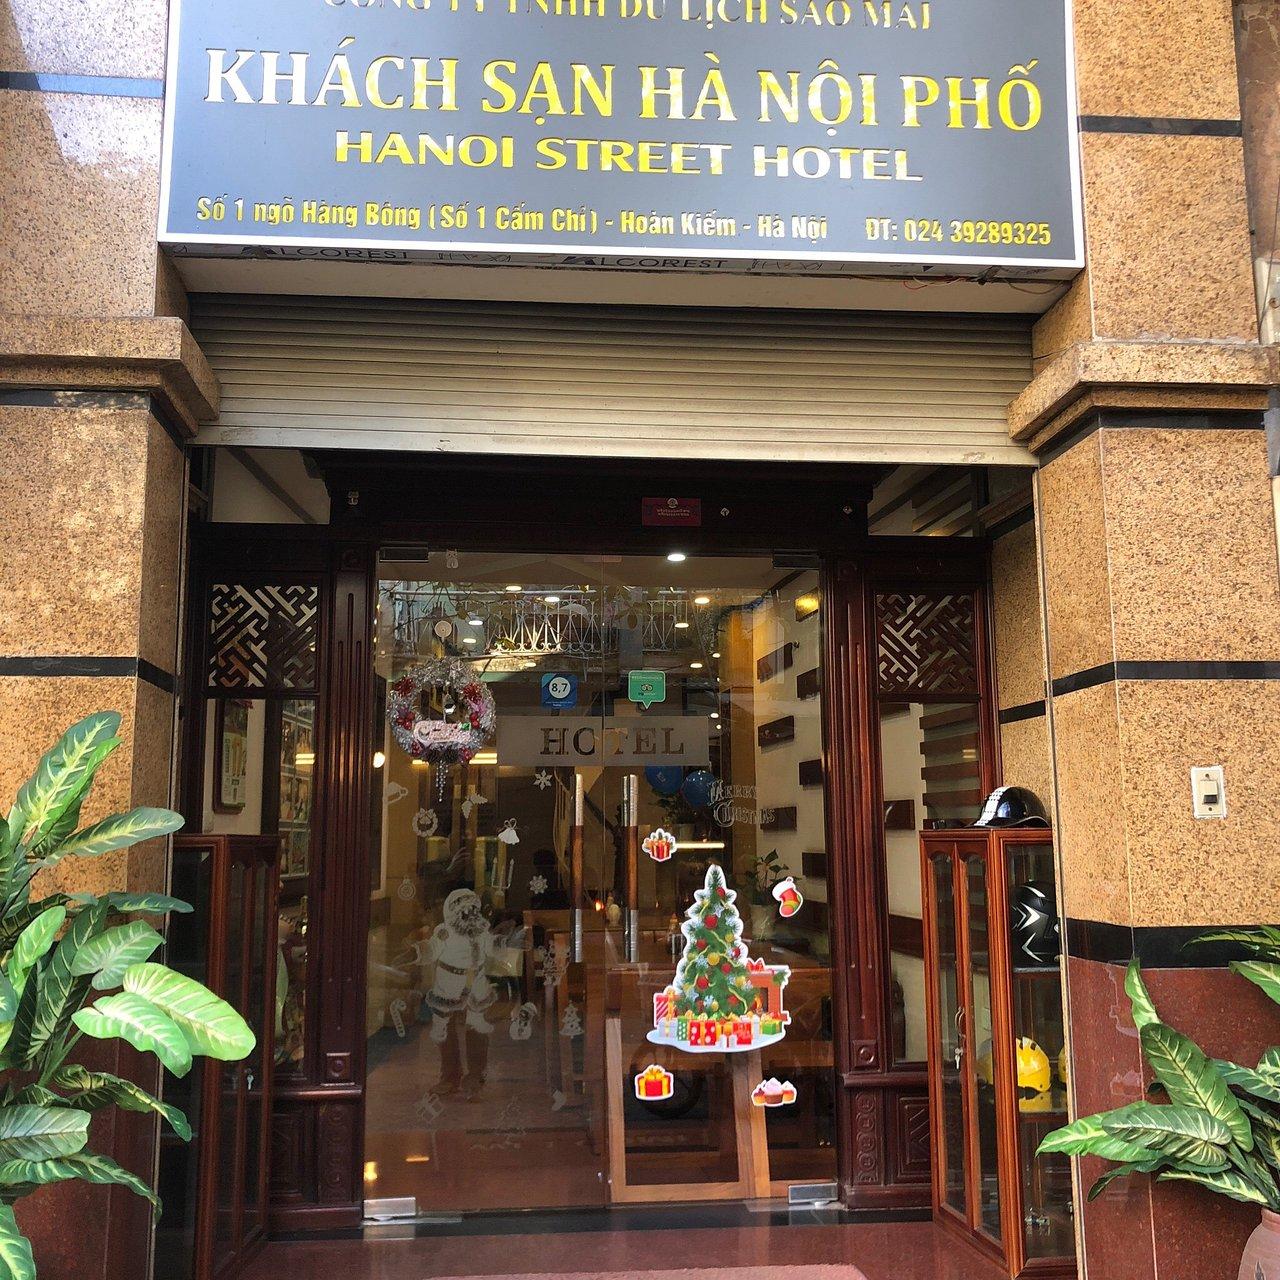 hanoi street hotel 20 2 8 prices reviews vietnam rh tripadvisor com